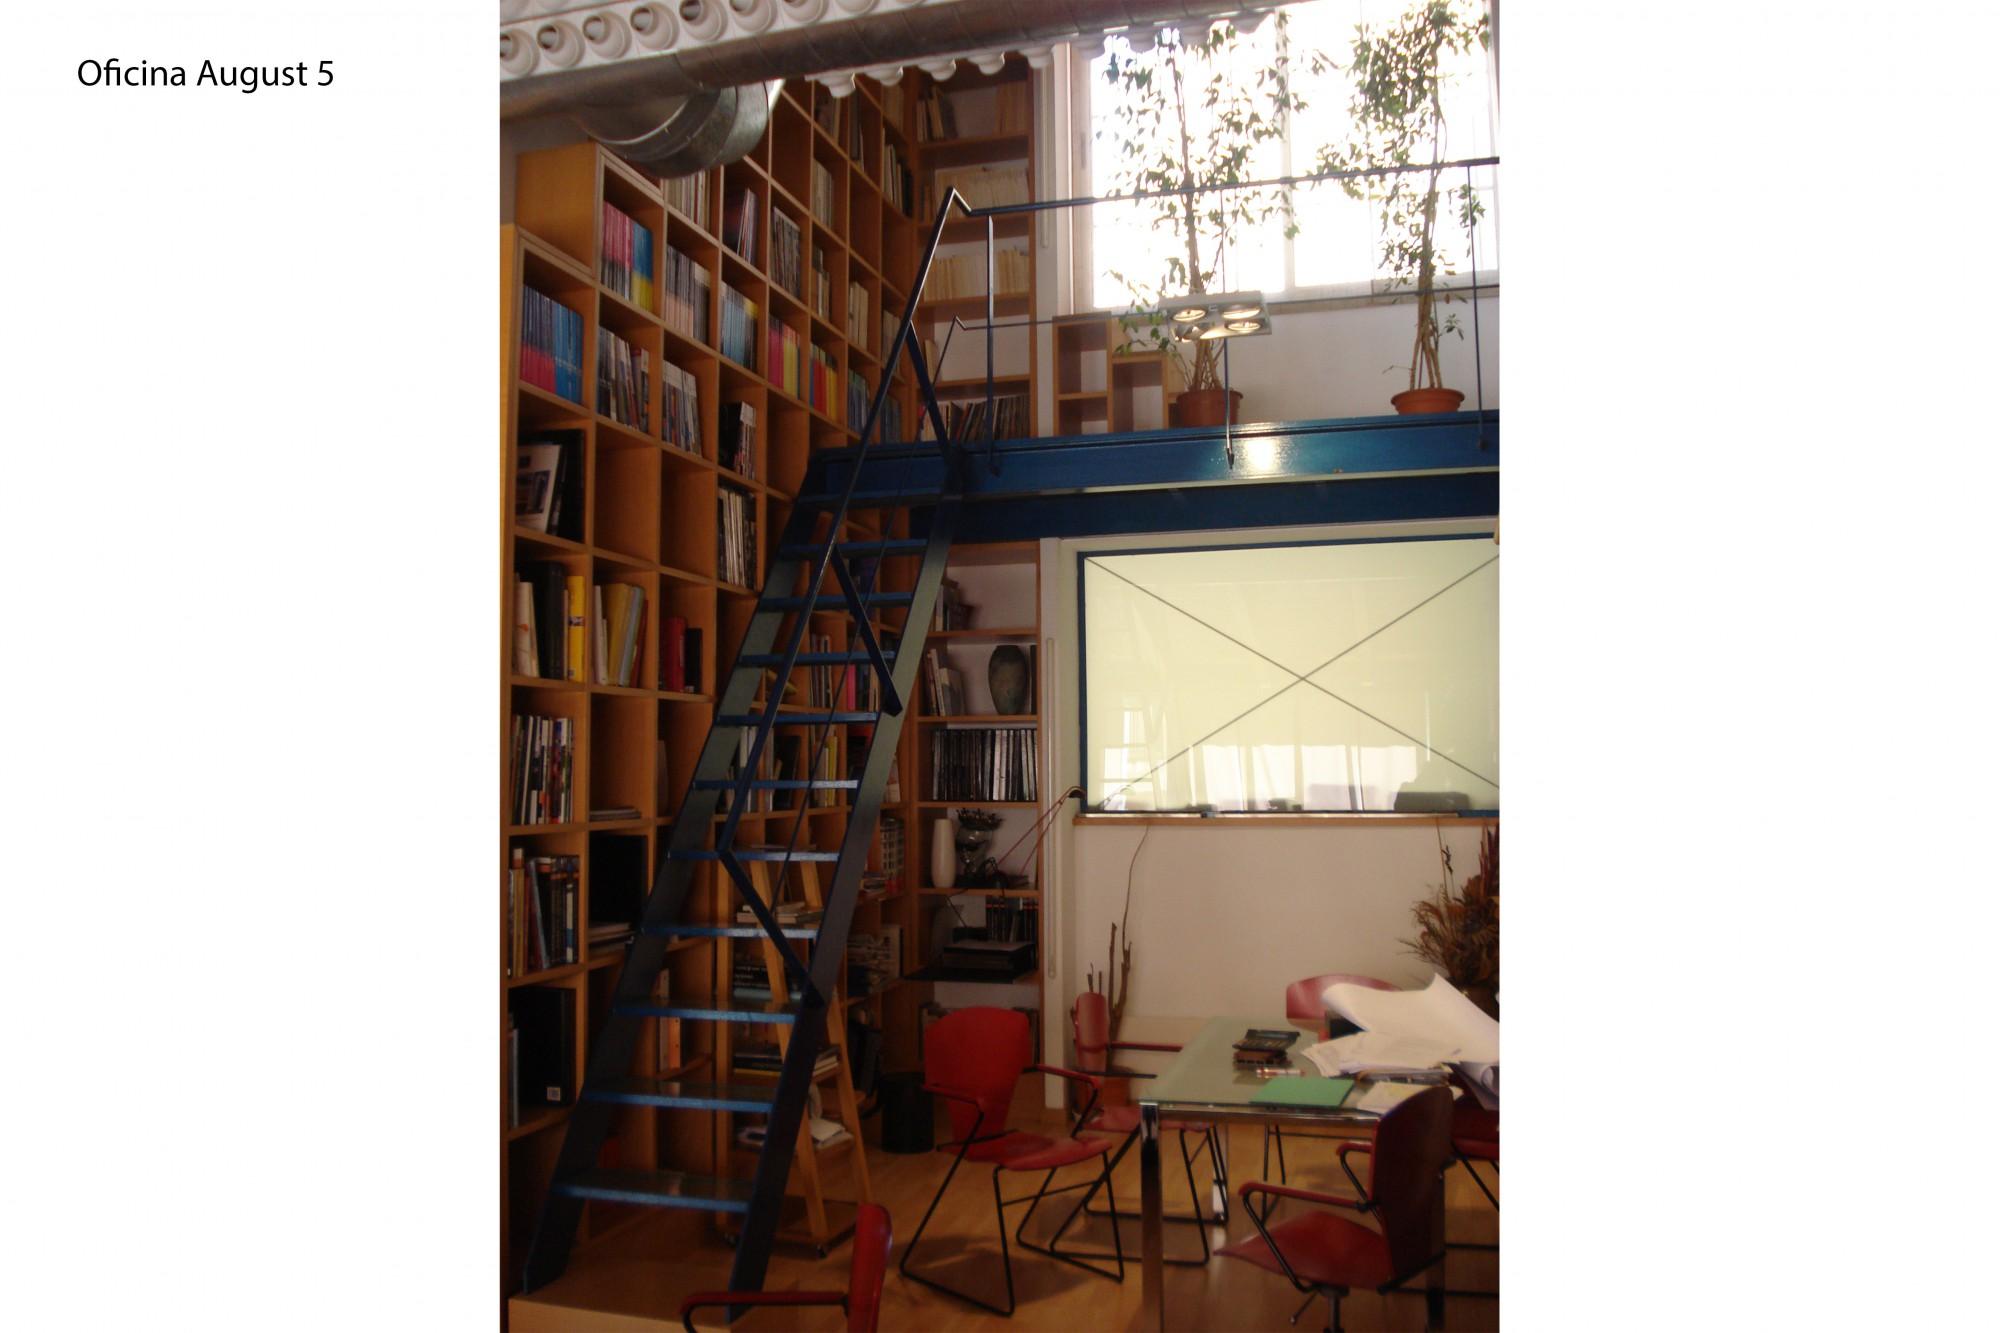 Oficina August 5 Tarragona